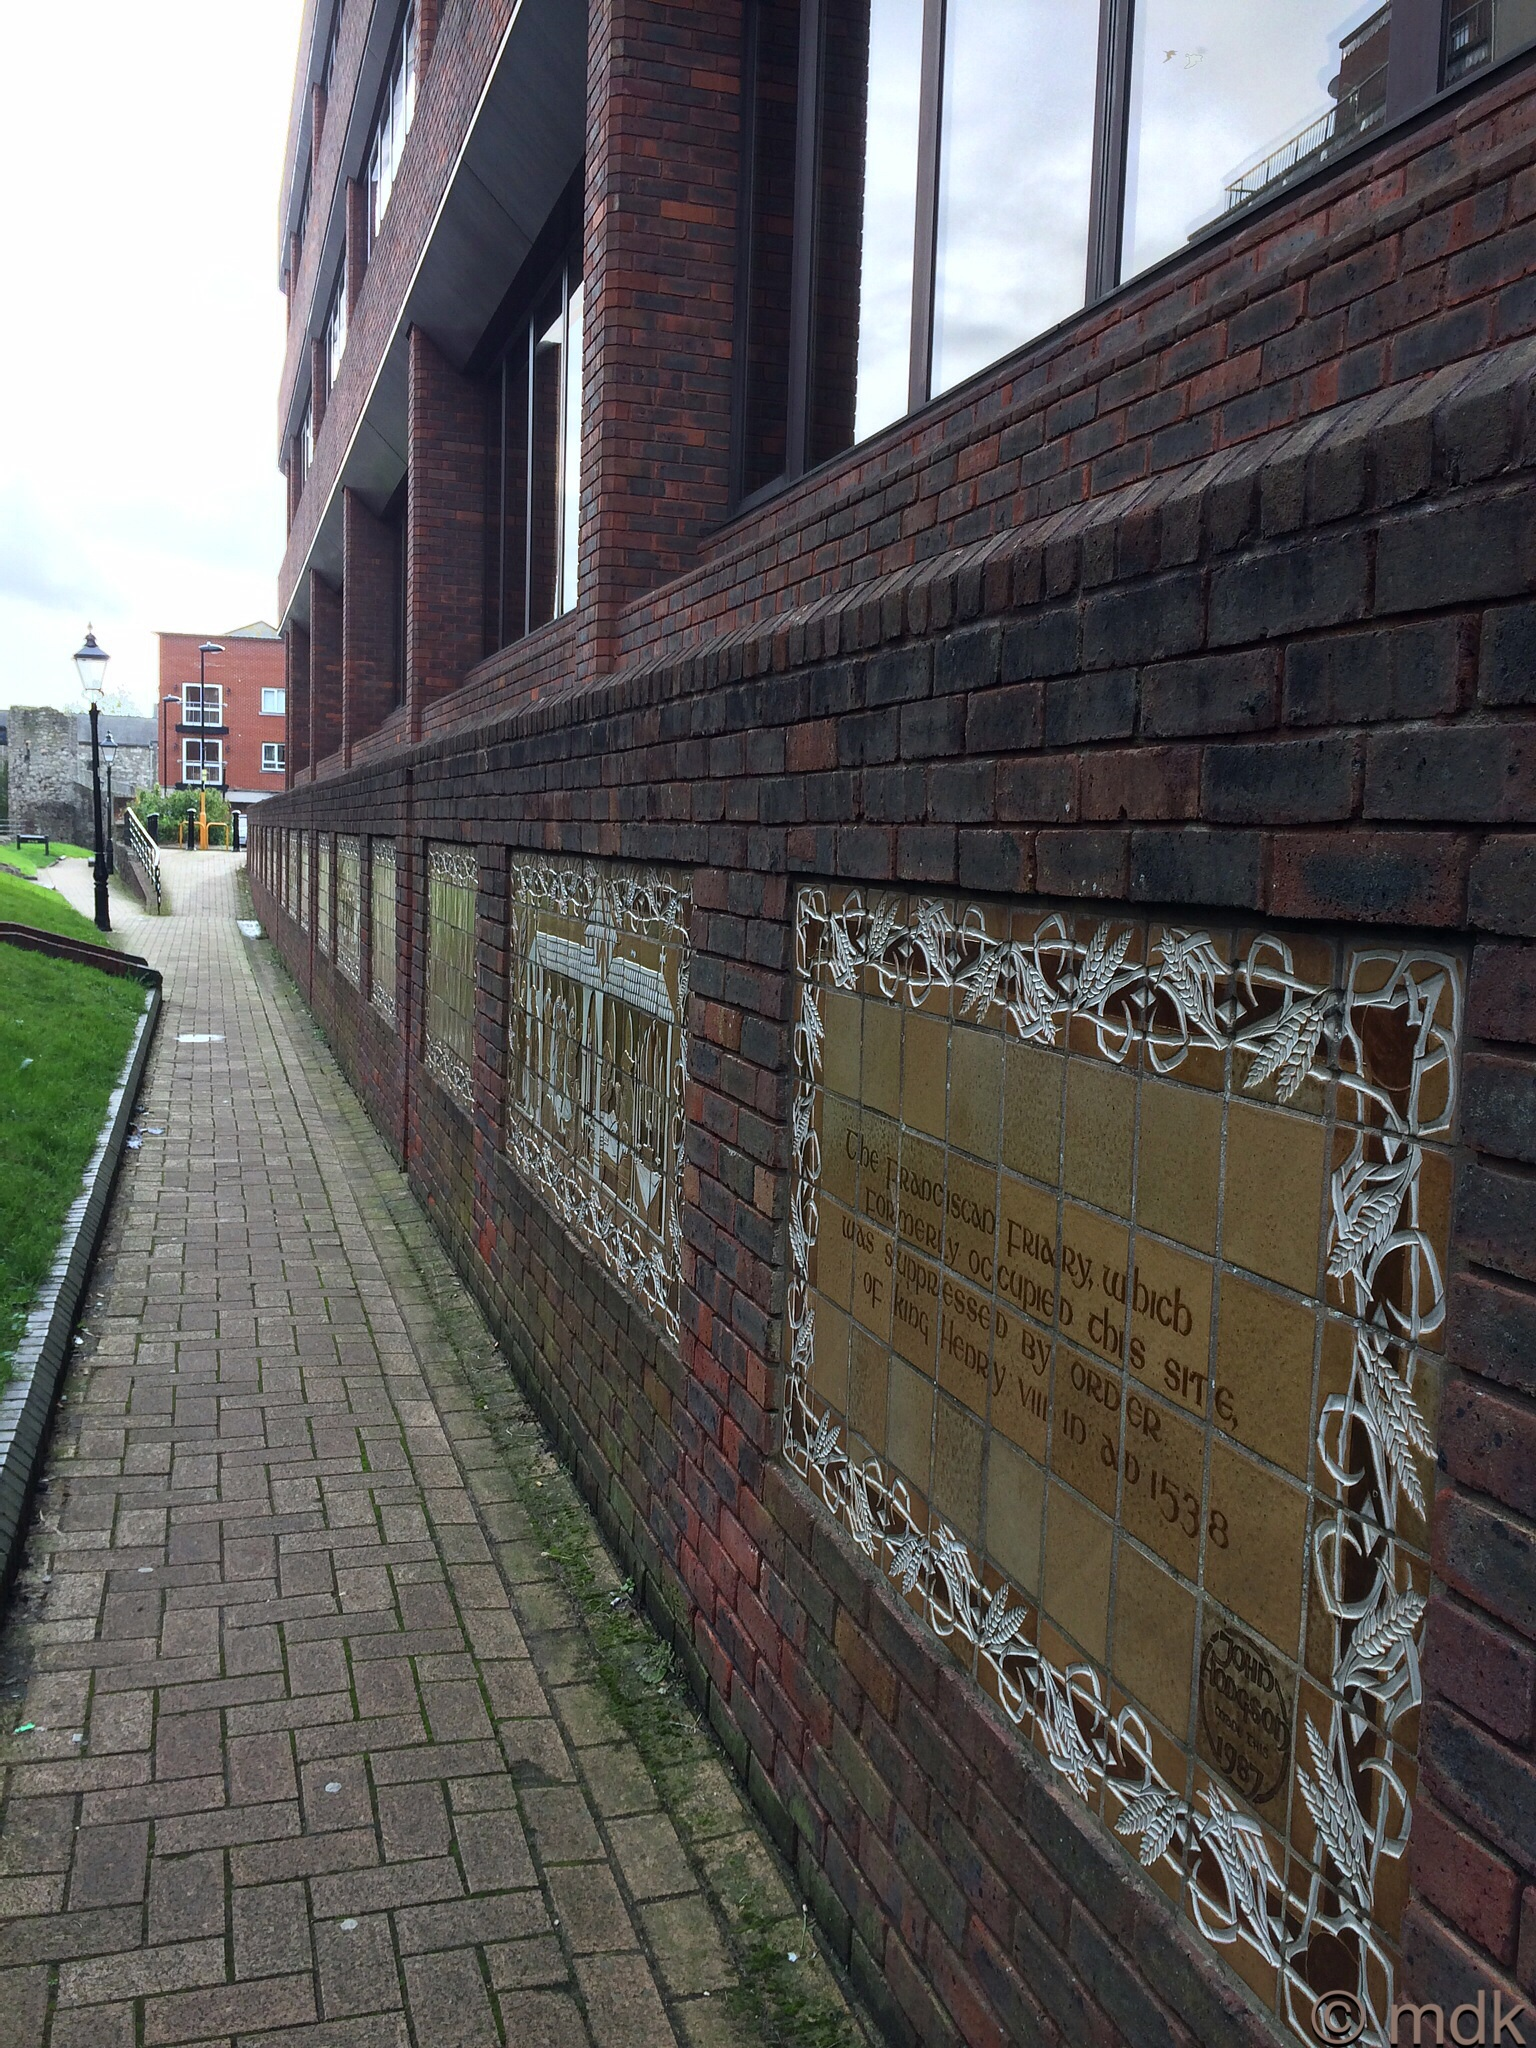 Commemorative tiles